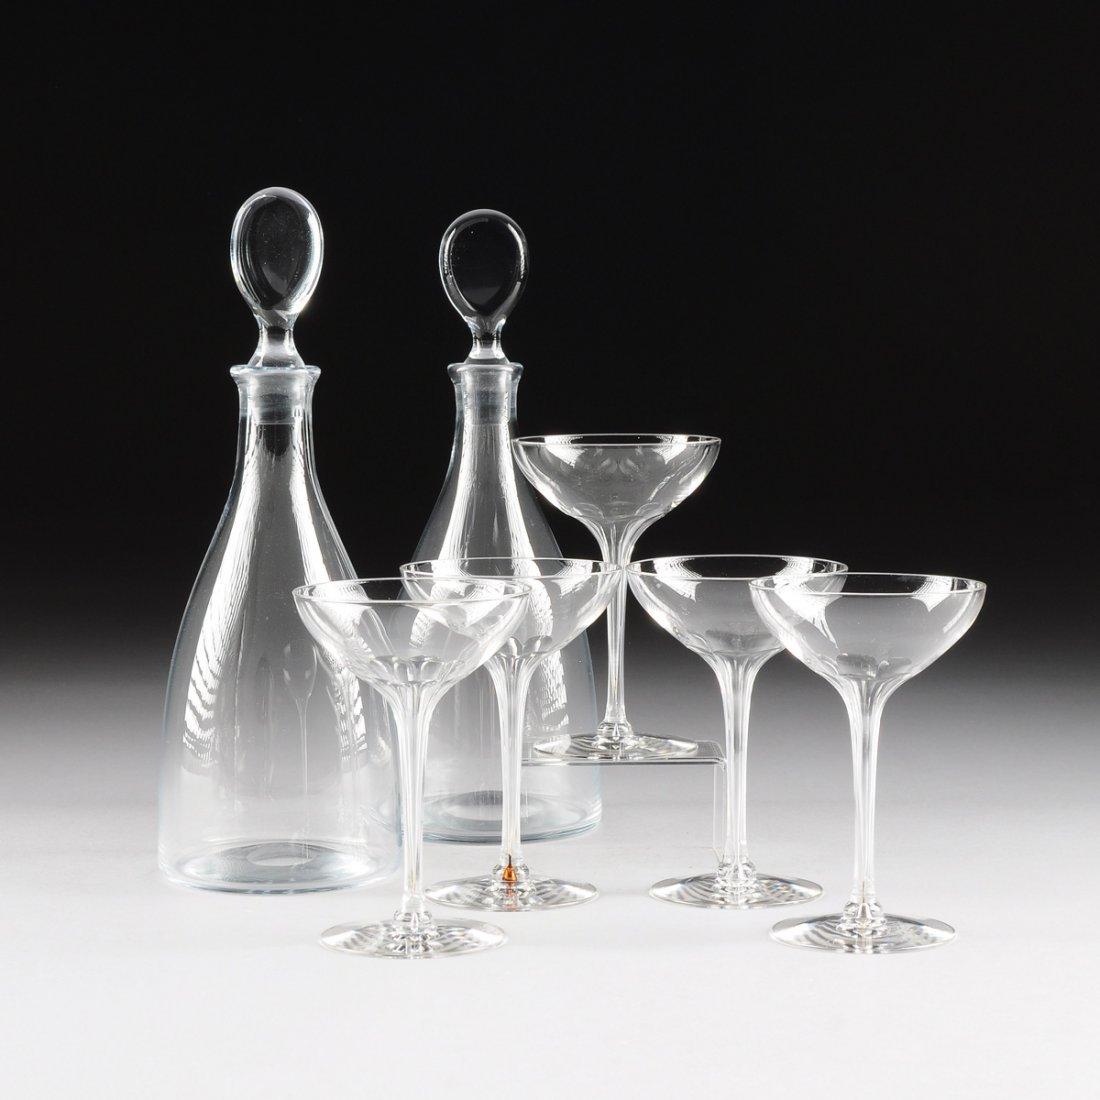 TWO SWEDISH ART GLASS DECANTERS, BY STROMBERGSHYTTAN,